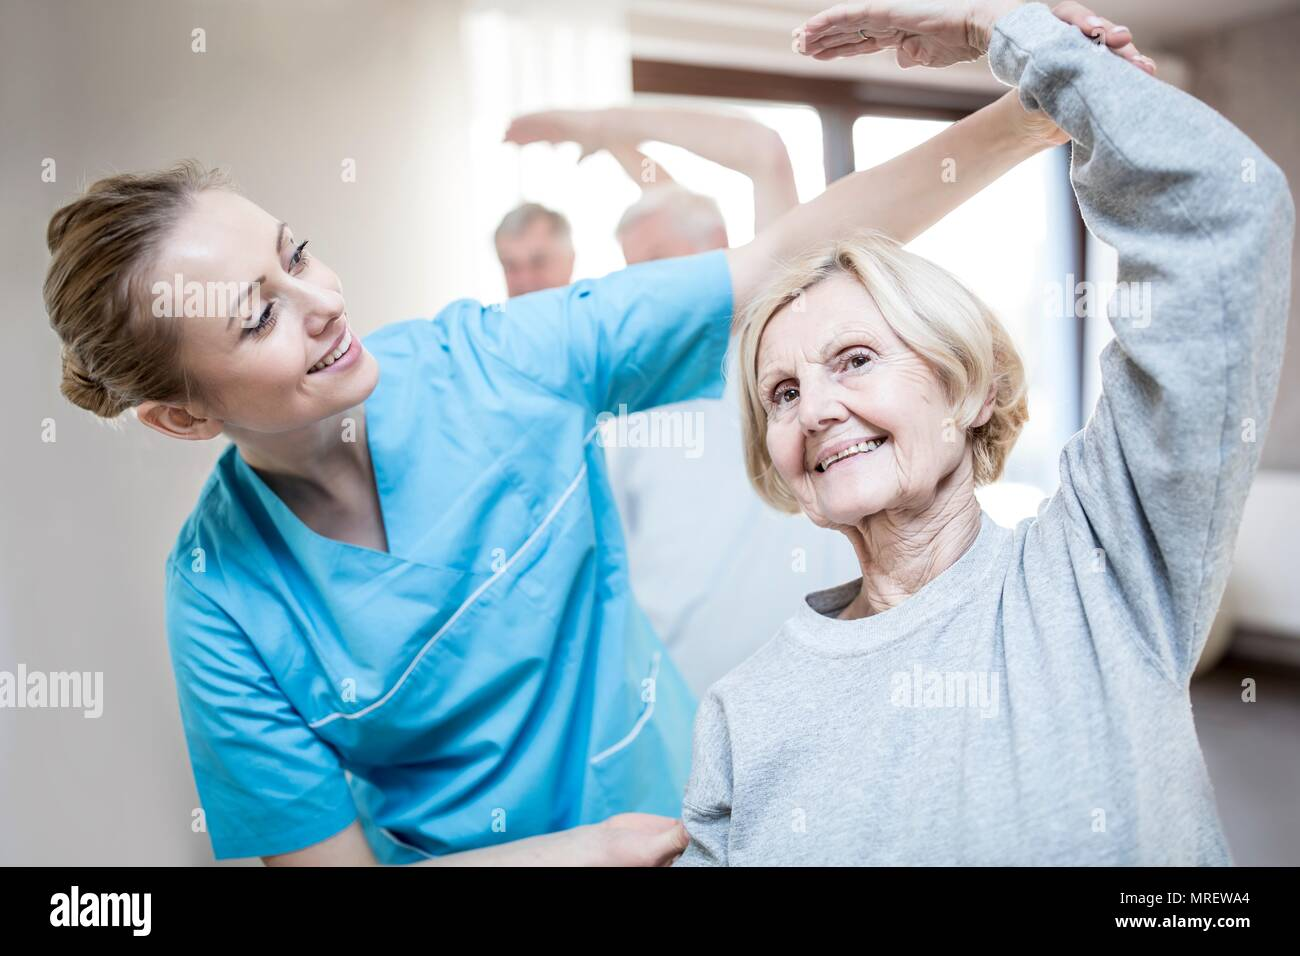 Senior woman stretching, physiotherapist helping. - Stock Image